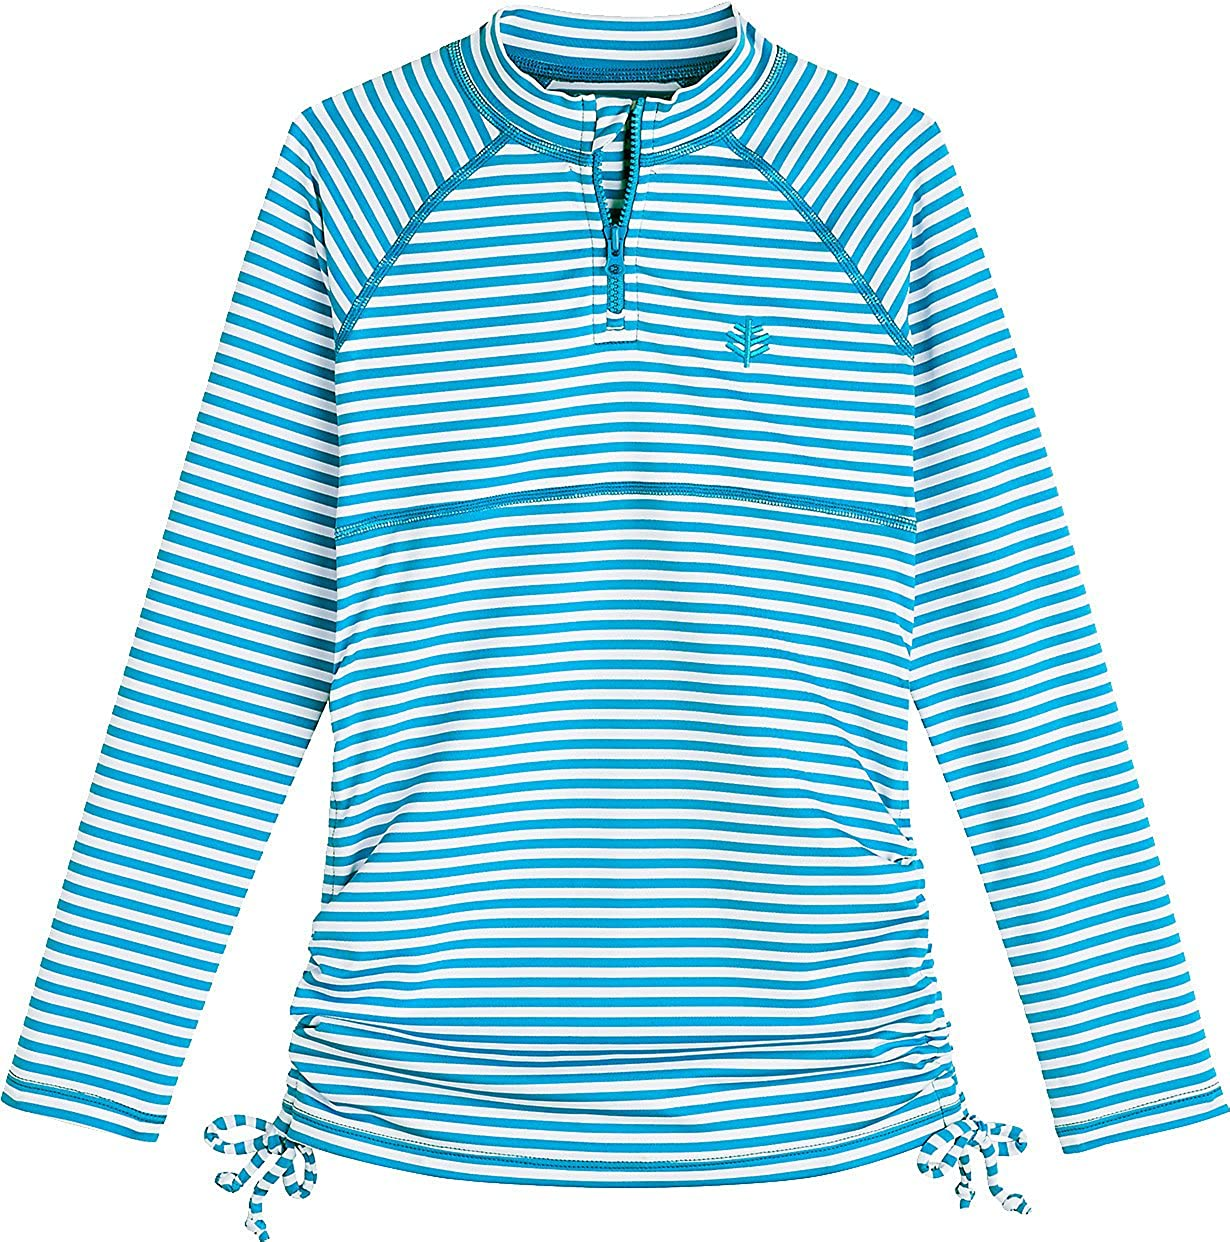 Sun Protective Girls Ruche Swim Shirt Coolibar UPF 50